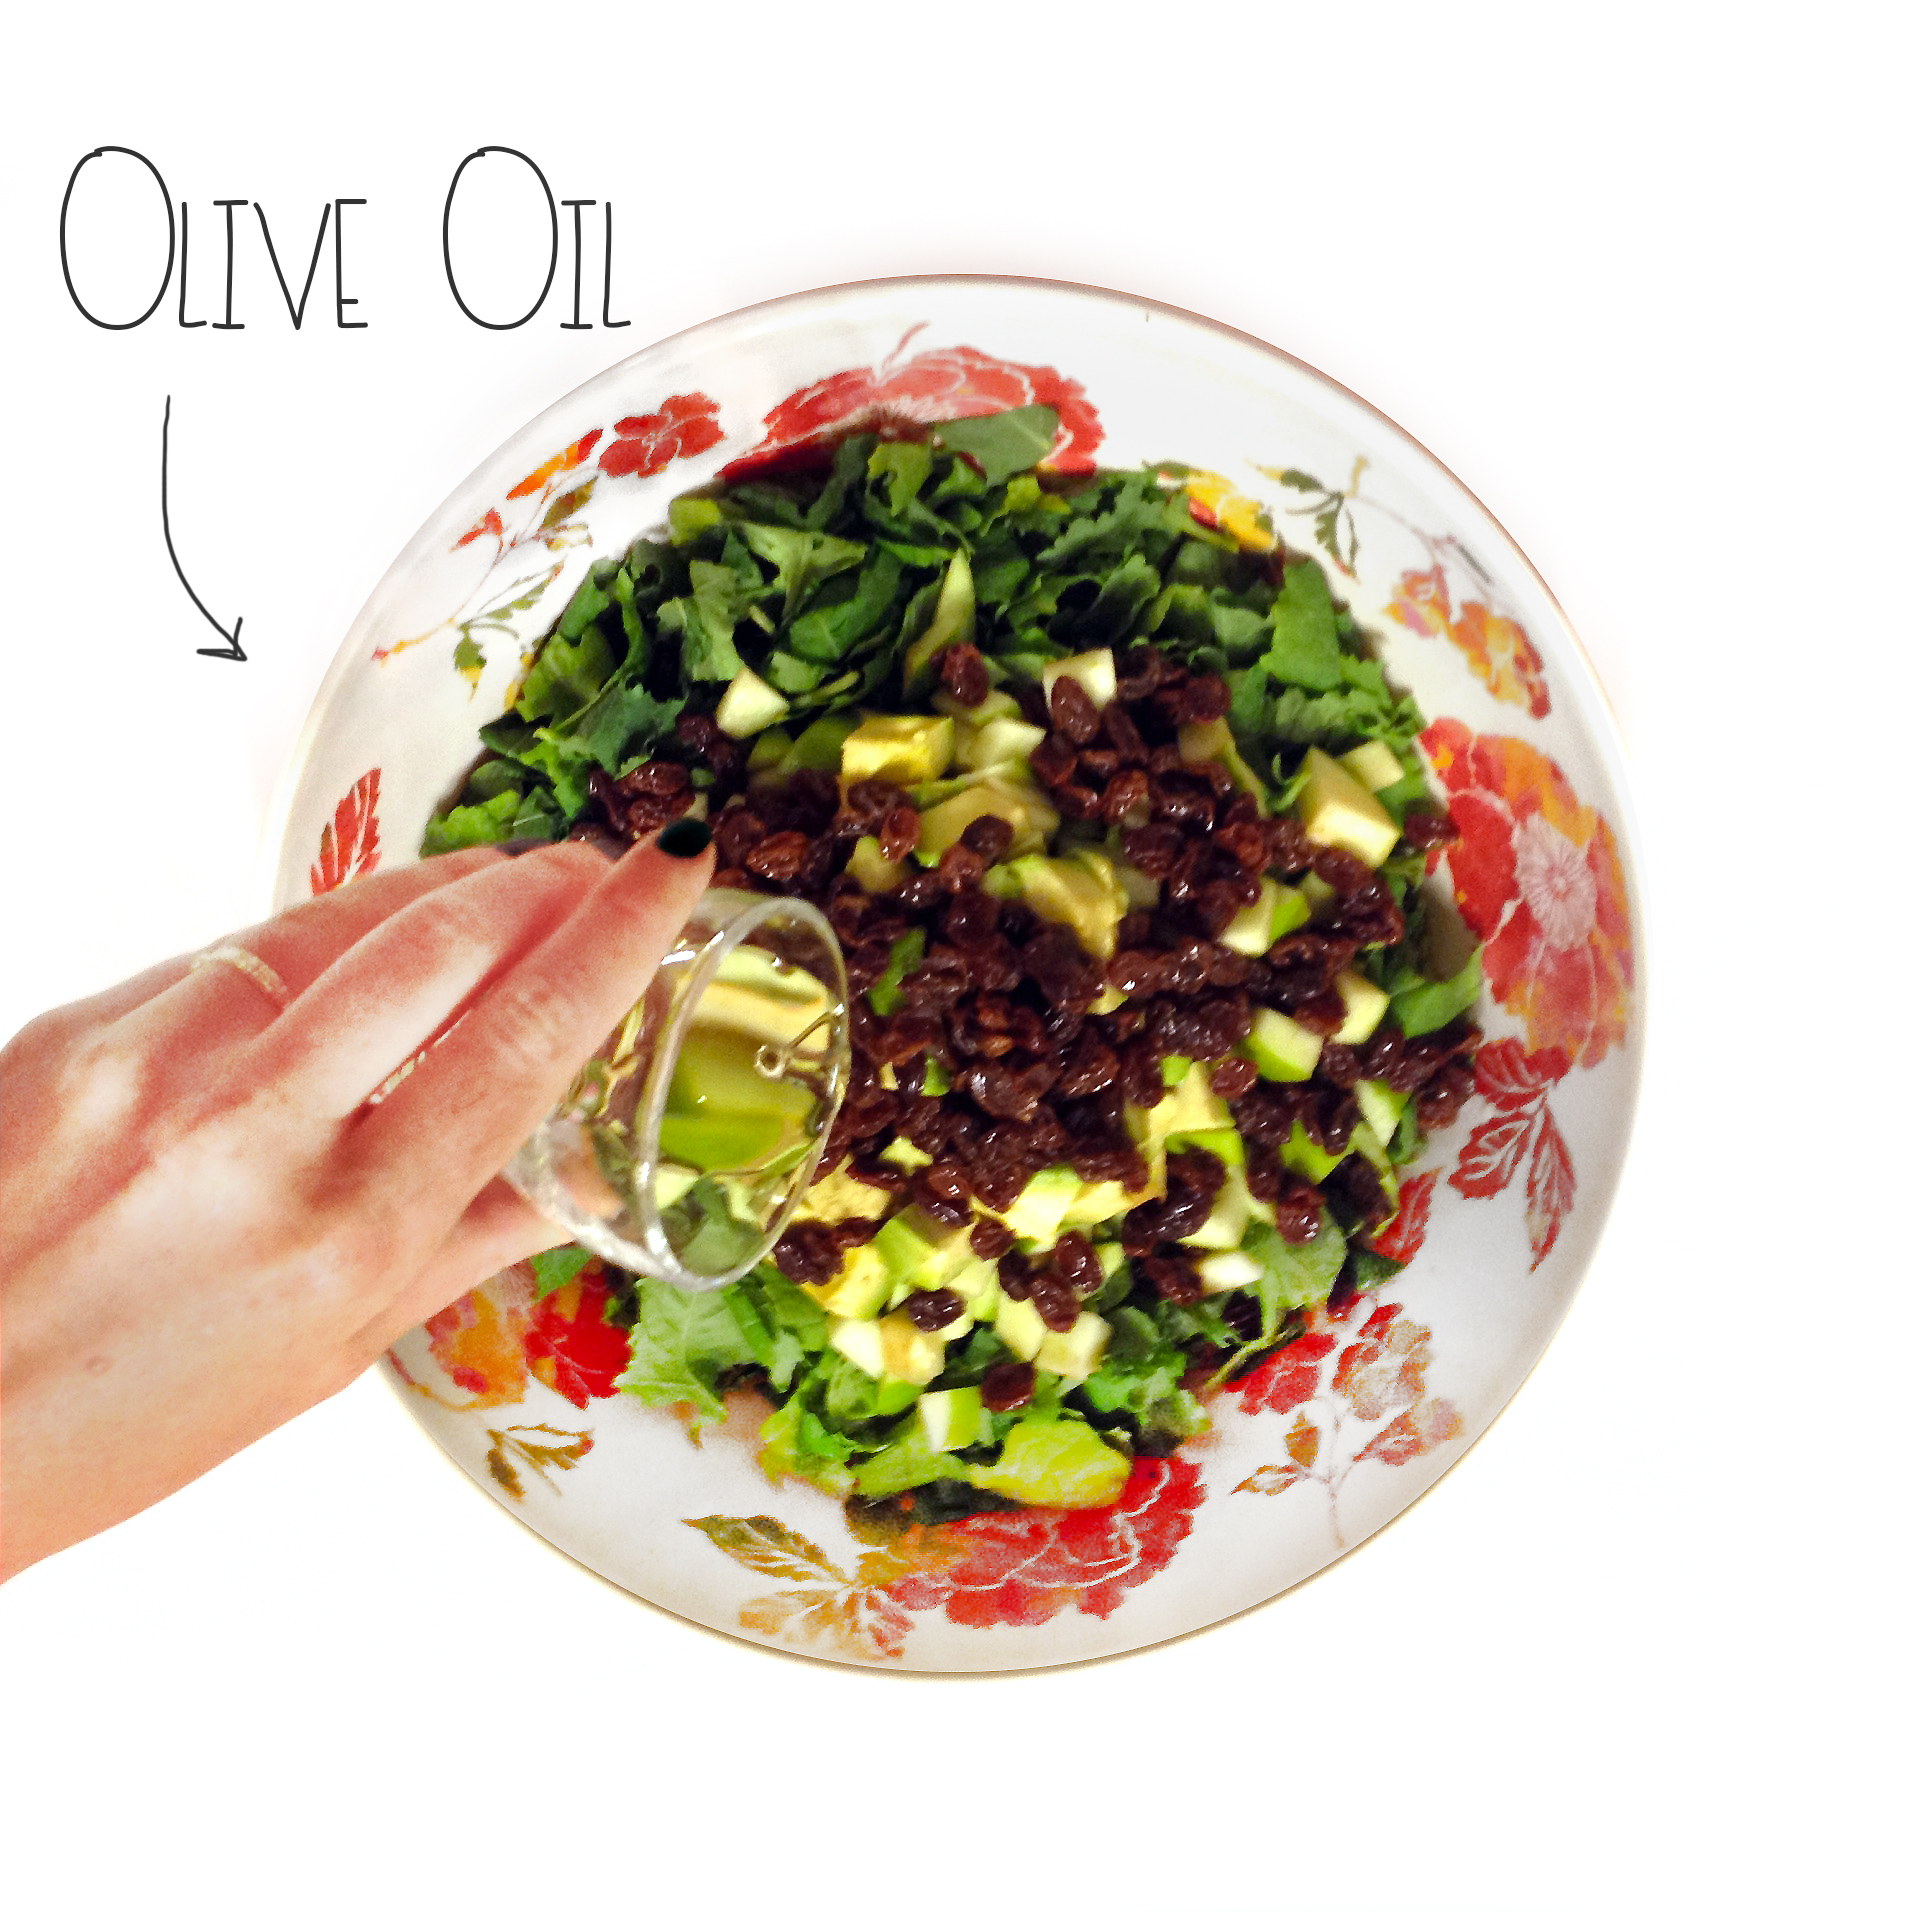 Olive Oil | MrsAmberAppleBlog